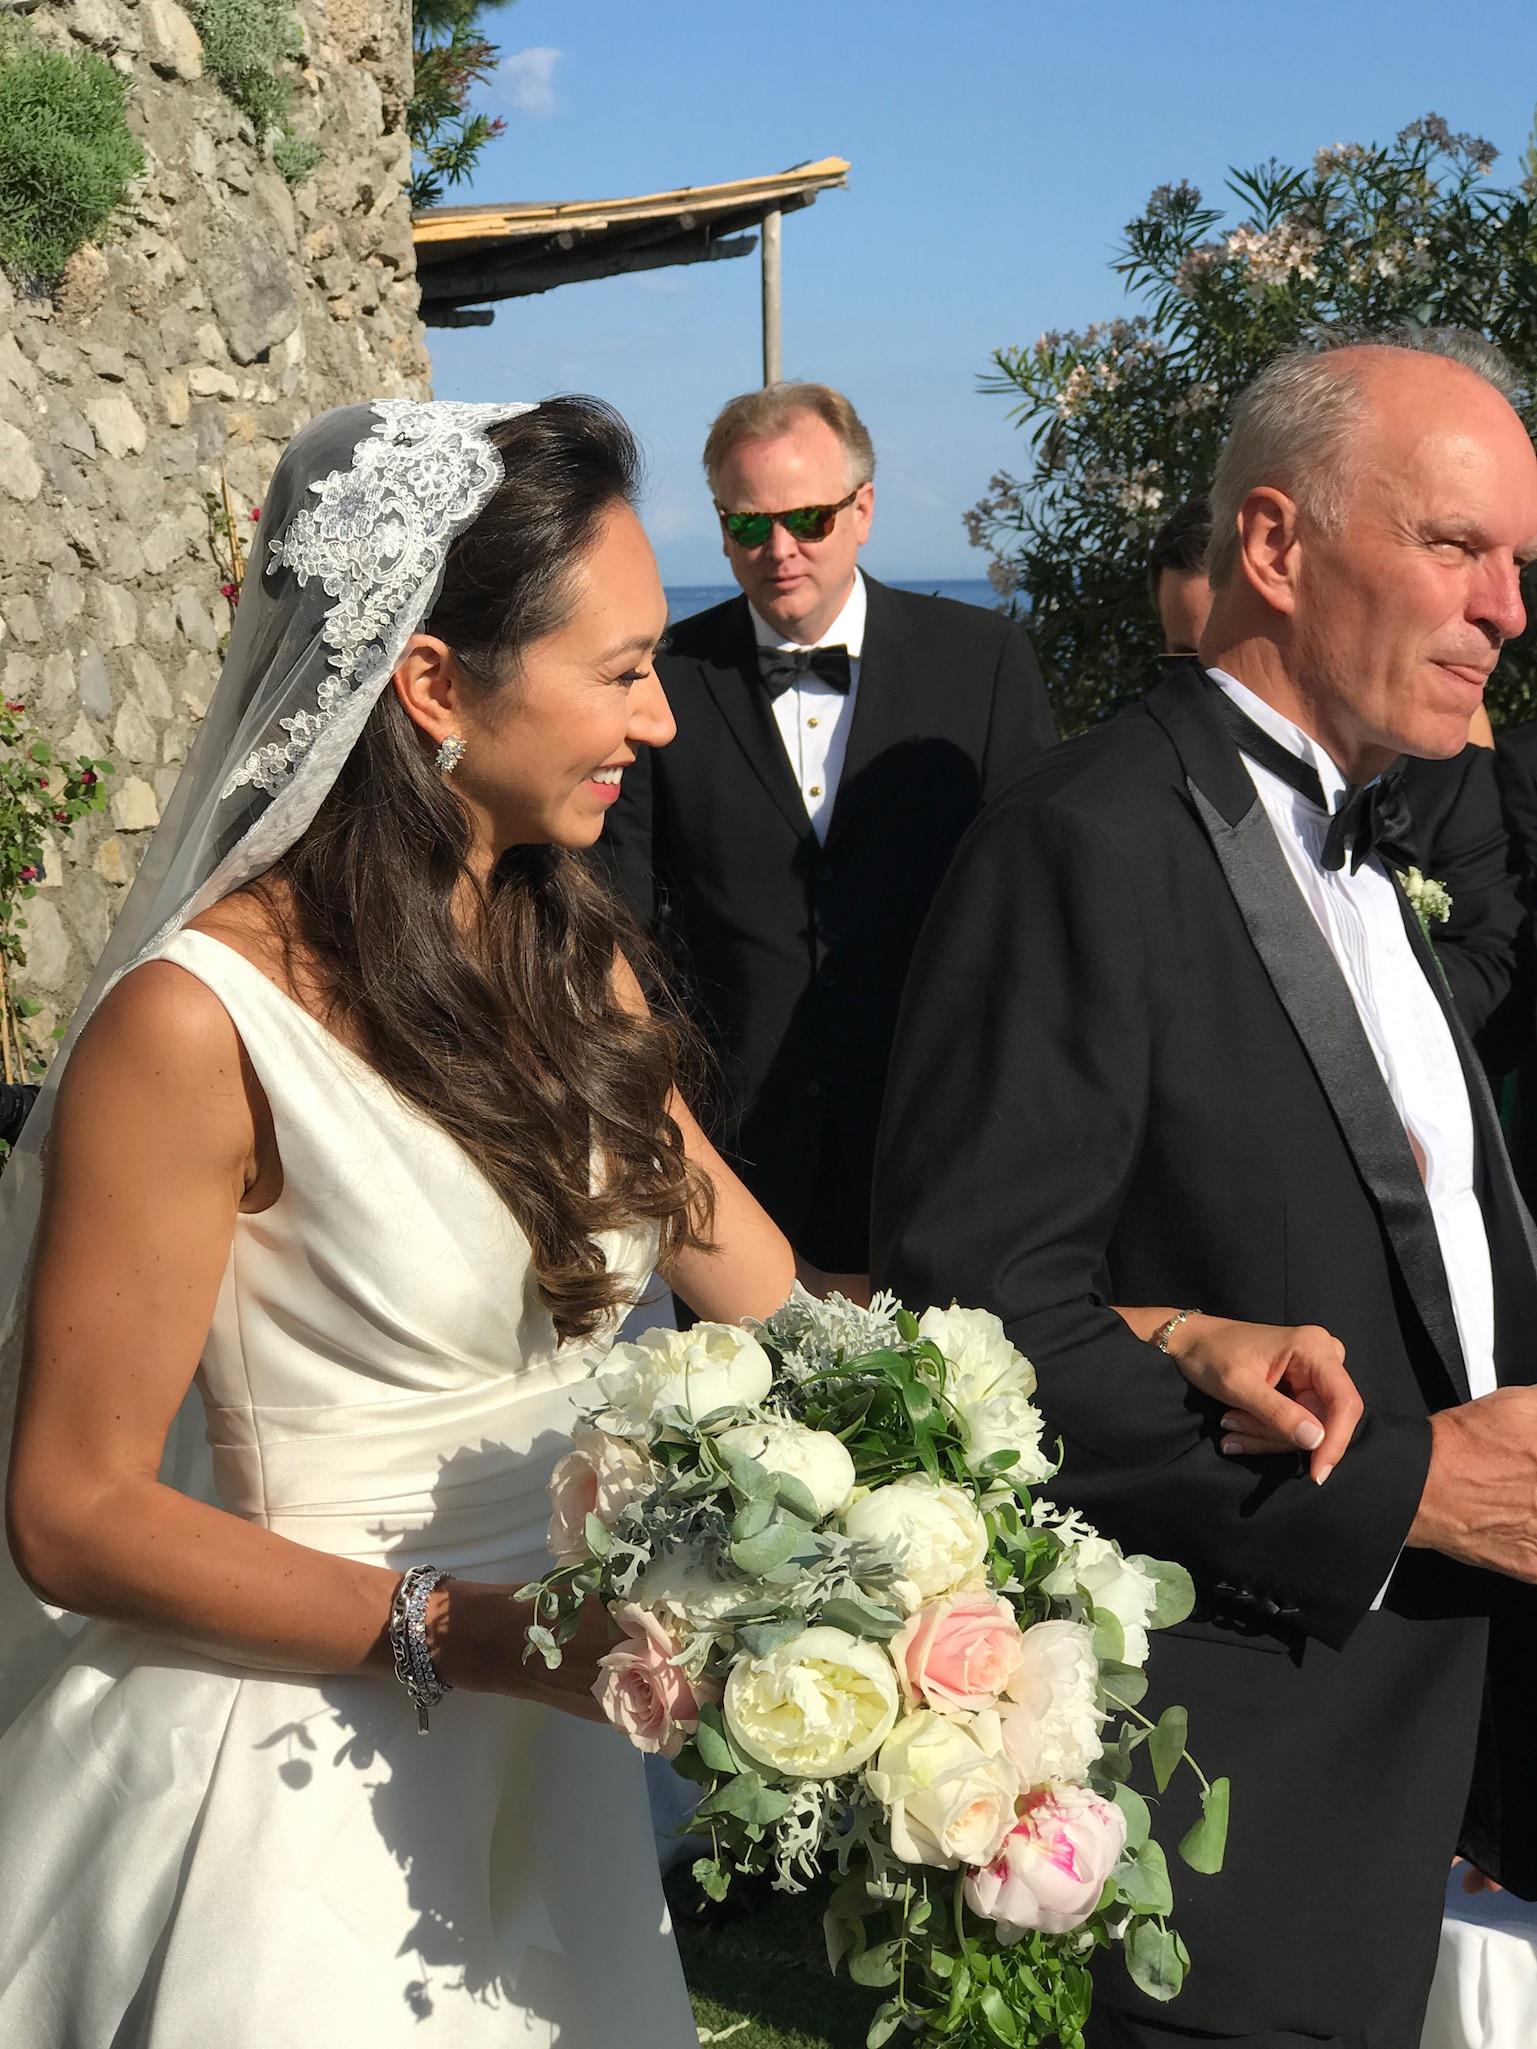 https://www.weddingamalfi.com/wp-content/uploads/Nathalie-and-Benjamin-Wedding-in-Positano-Italy-17.jpg